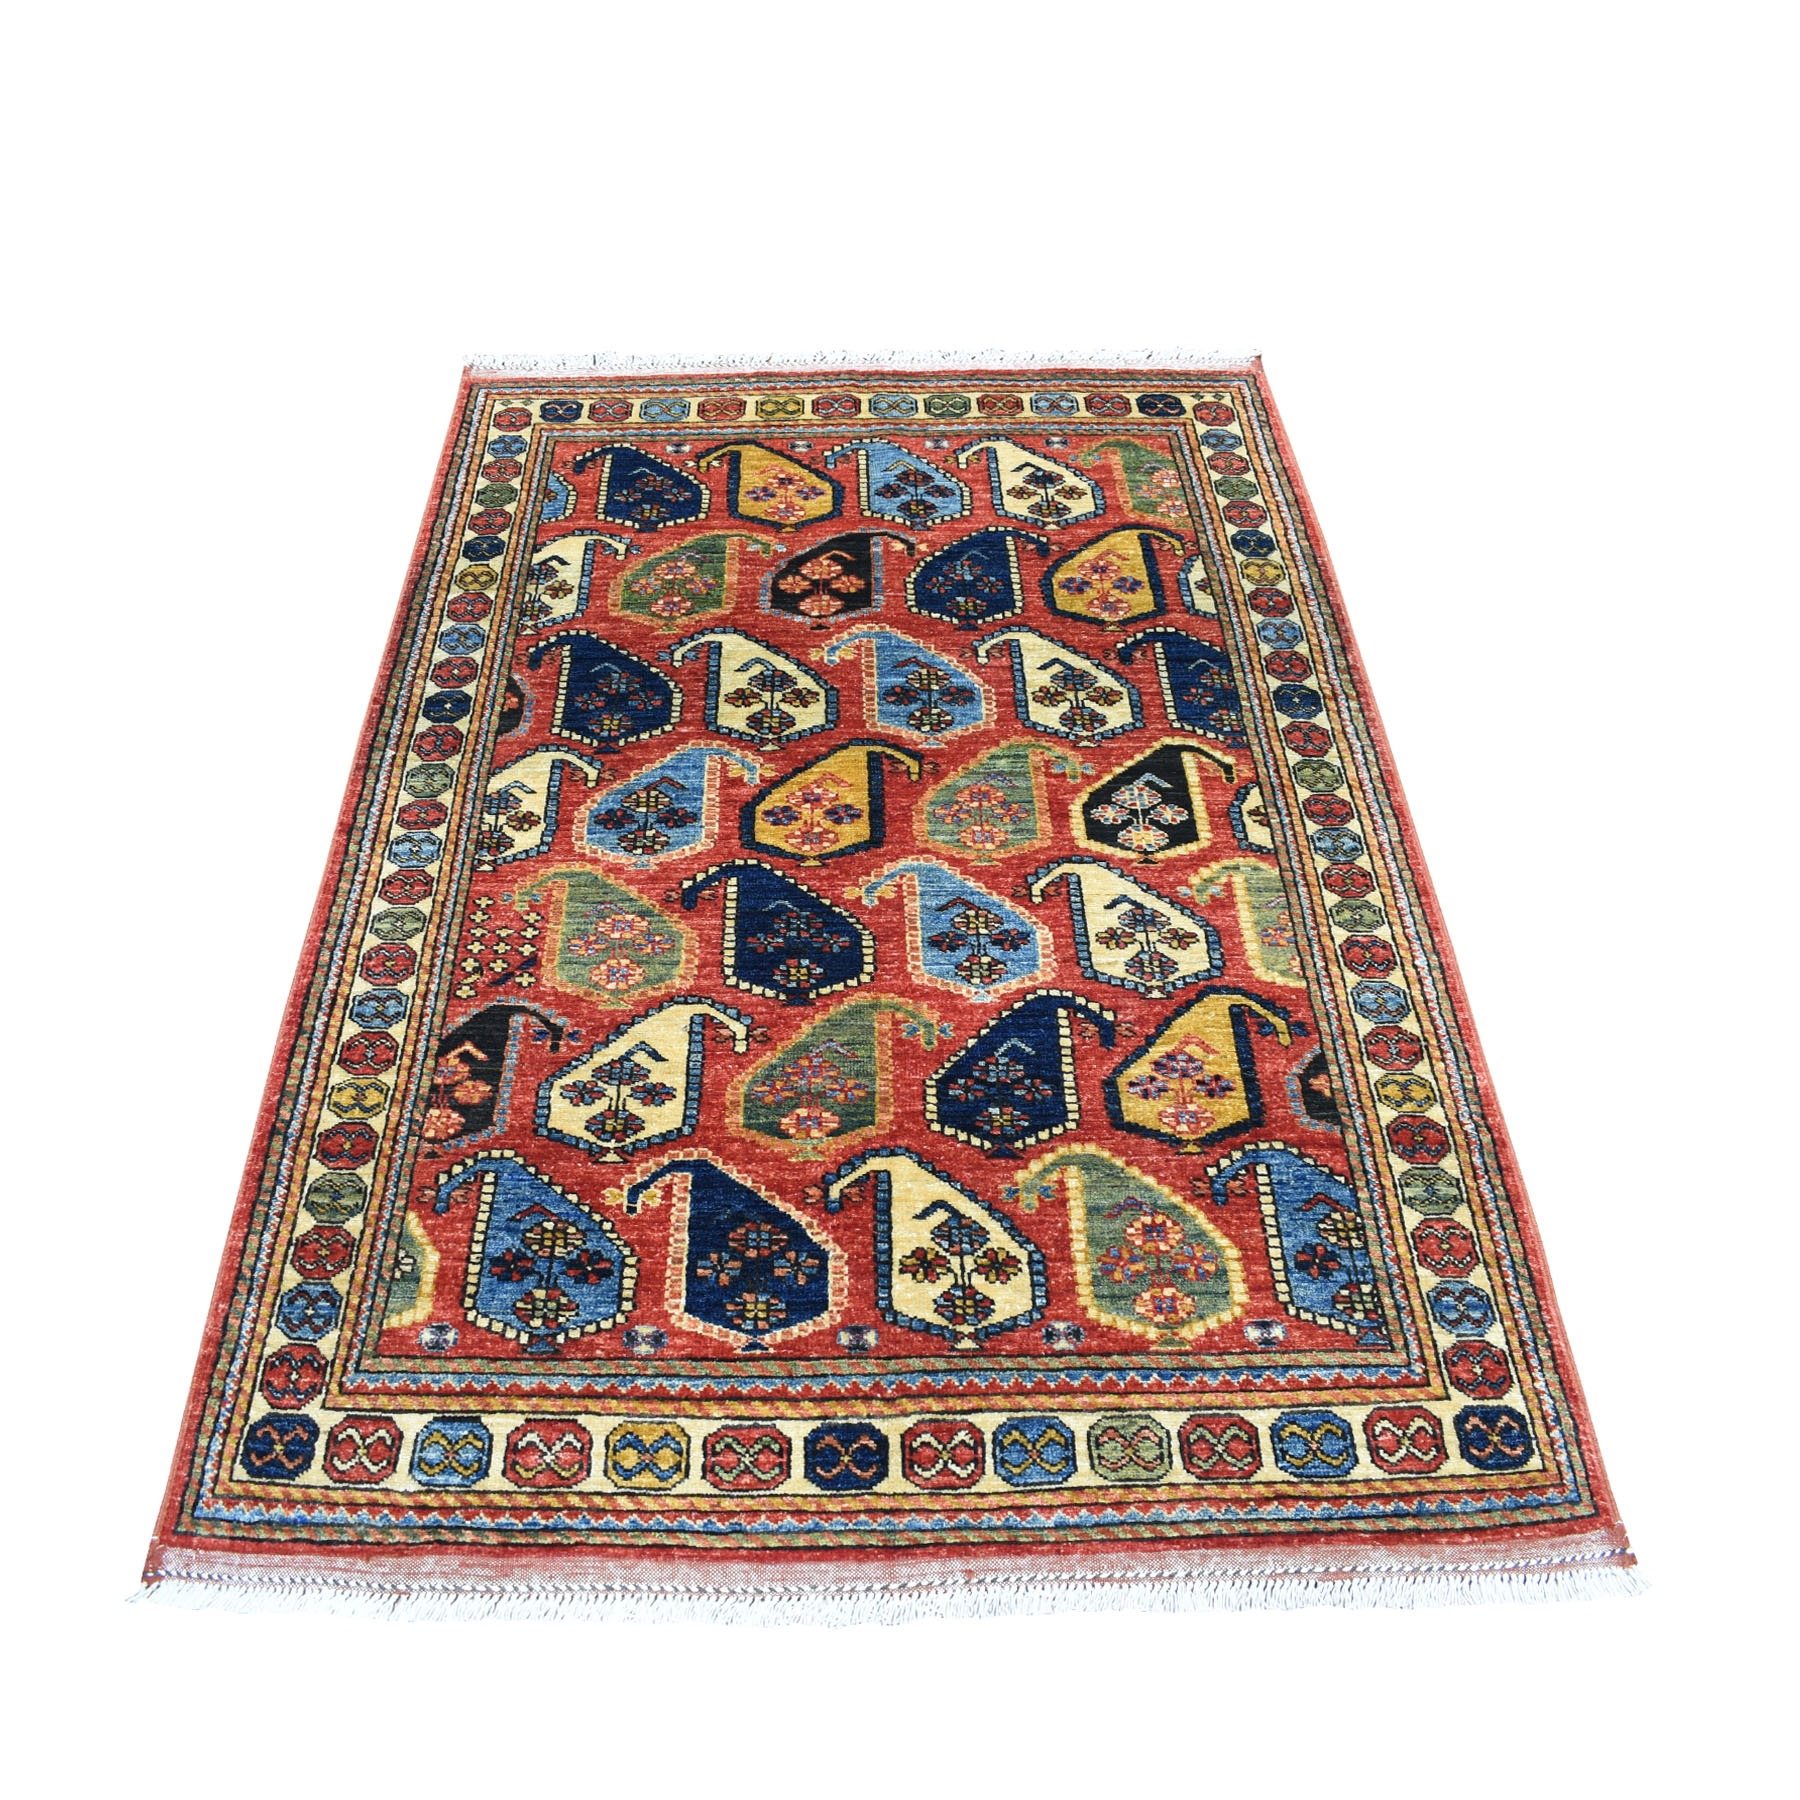 "4'X5'10"" Red Afghan Turkoman Ersari Paisley Design Hand Knotted Pure Wool Oriental Rug moaecac0"